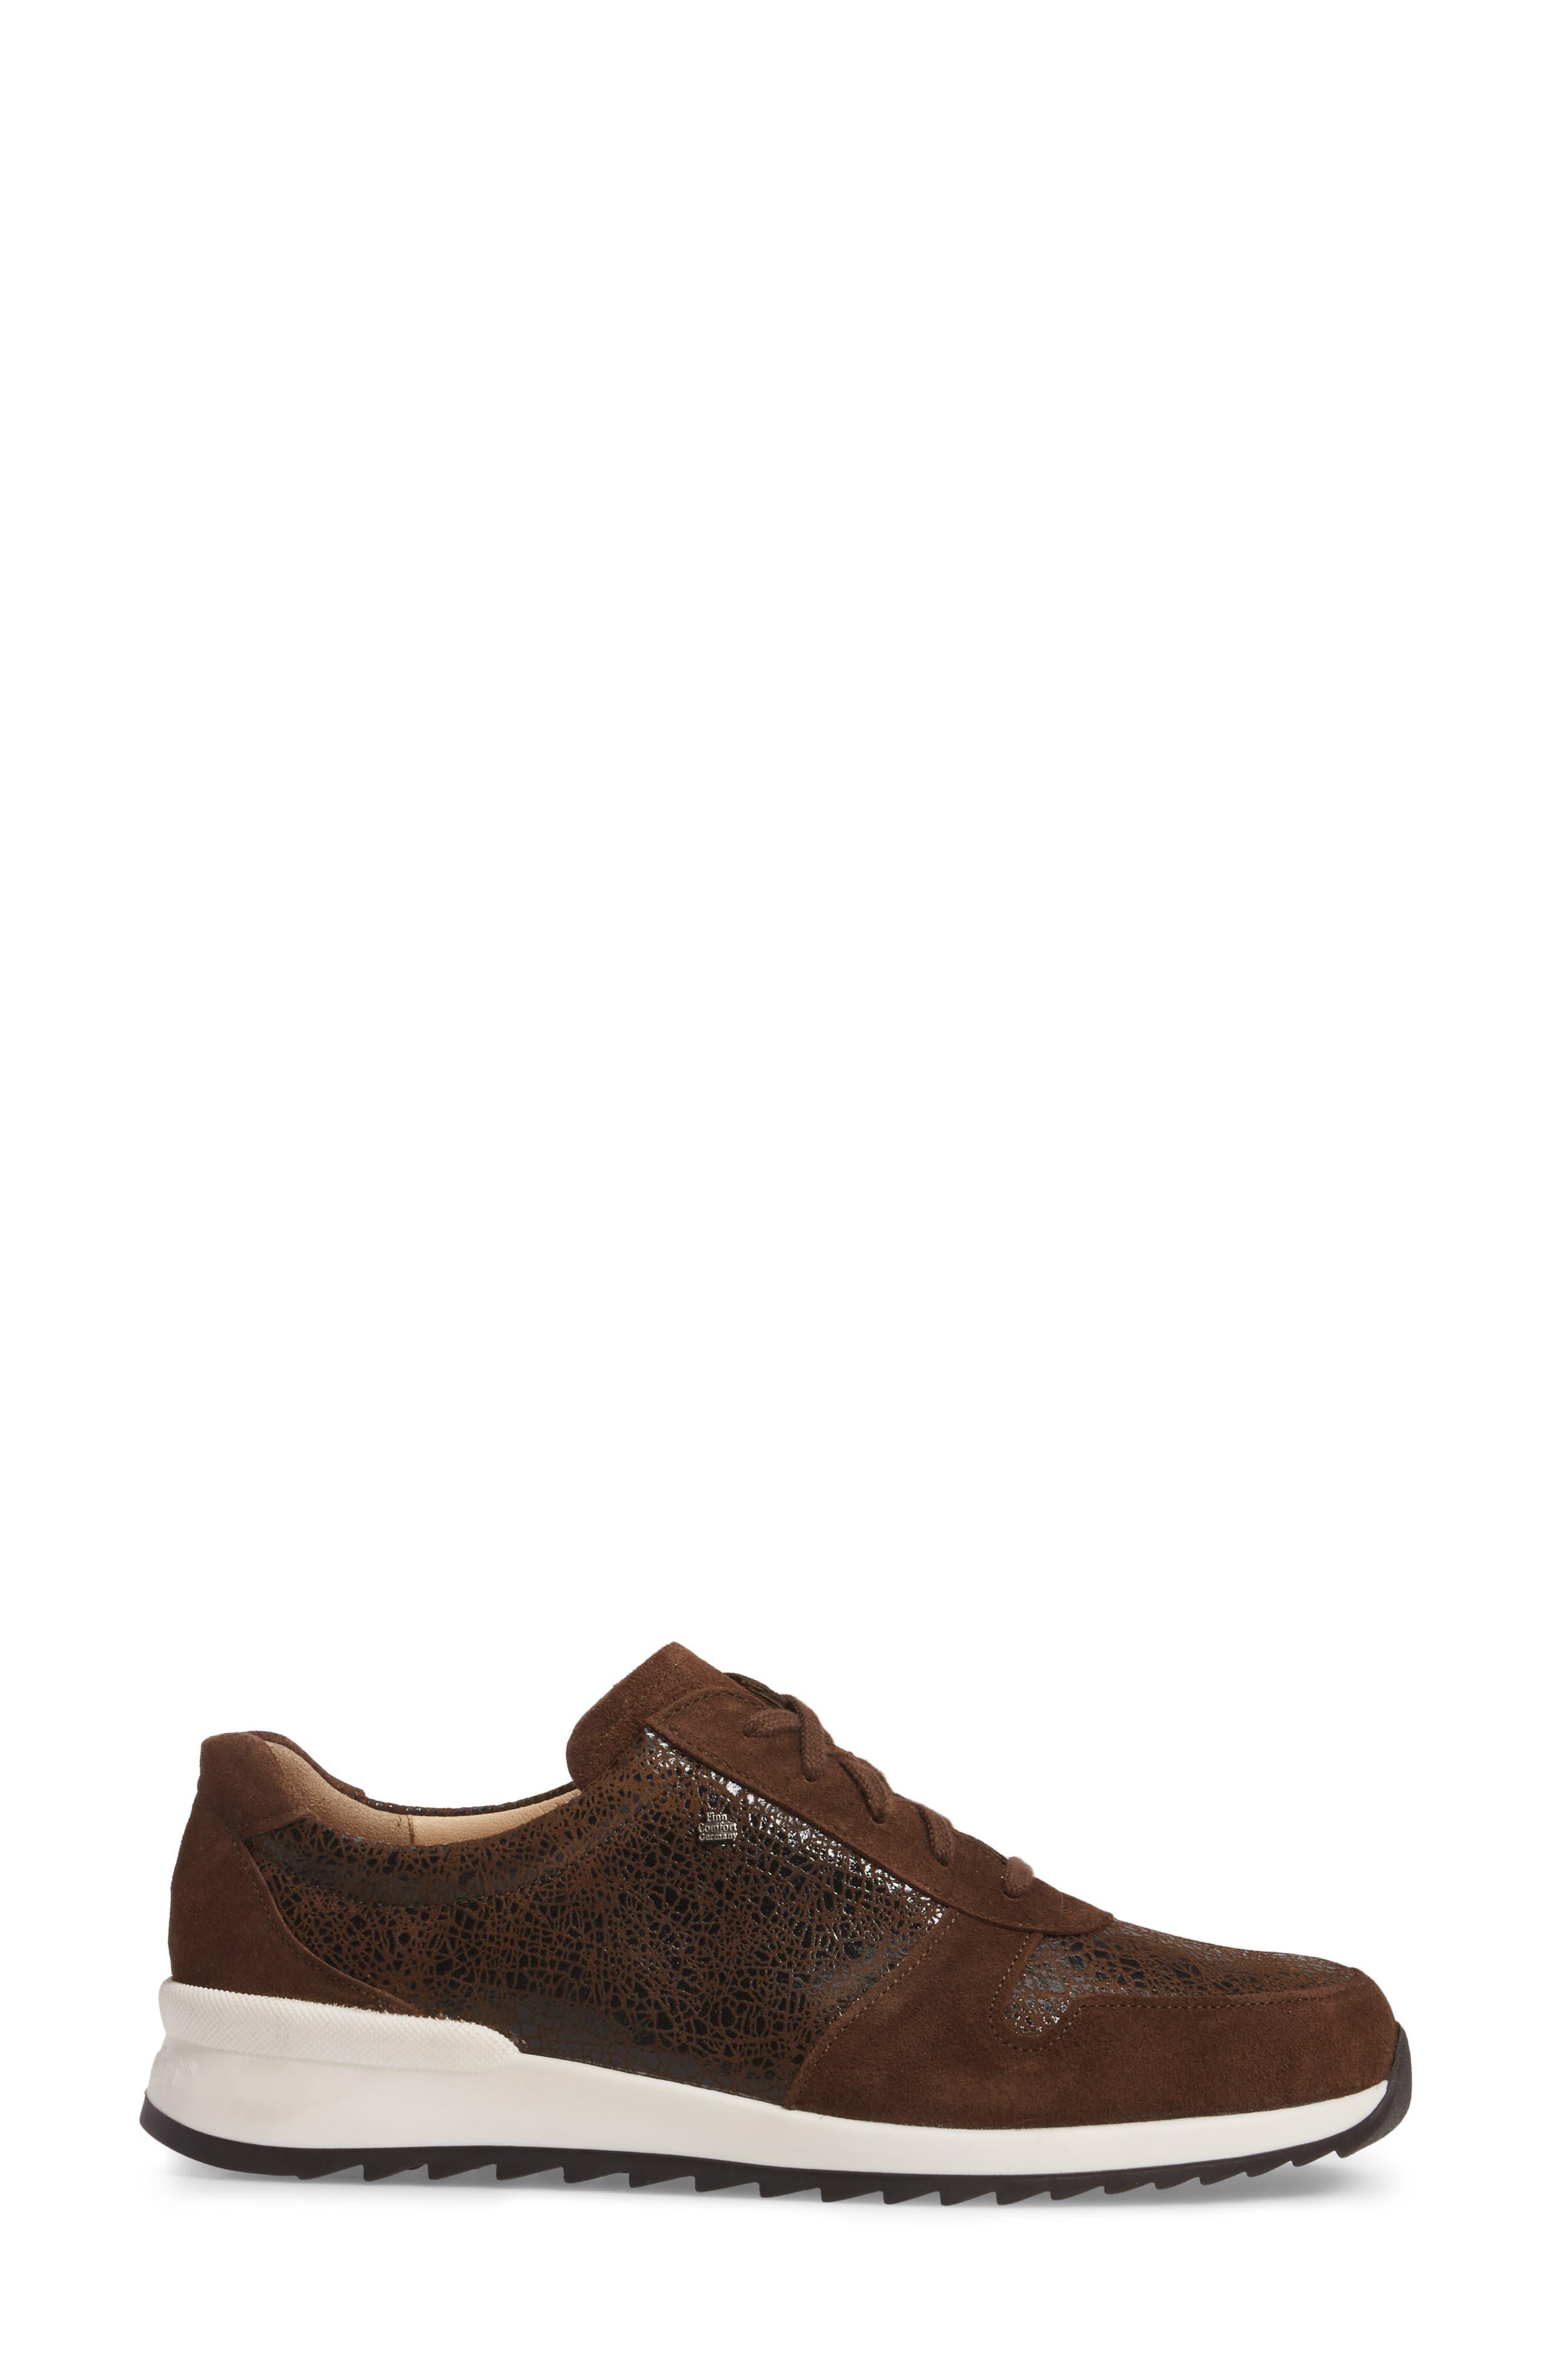 FINN COMFORT,                             Sidonia Sneaker,                             Alternate thumbnail 3, color,                             207